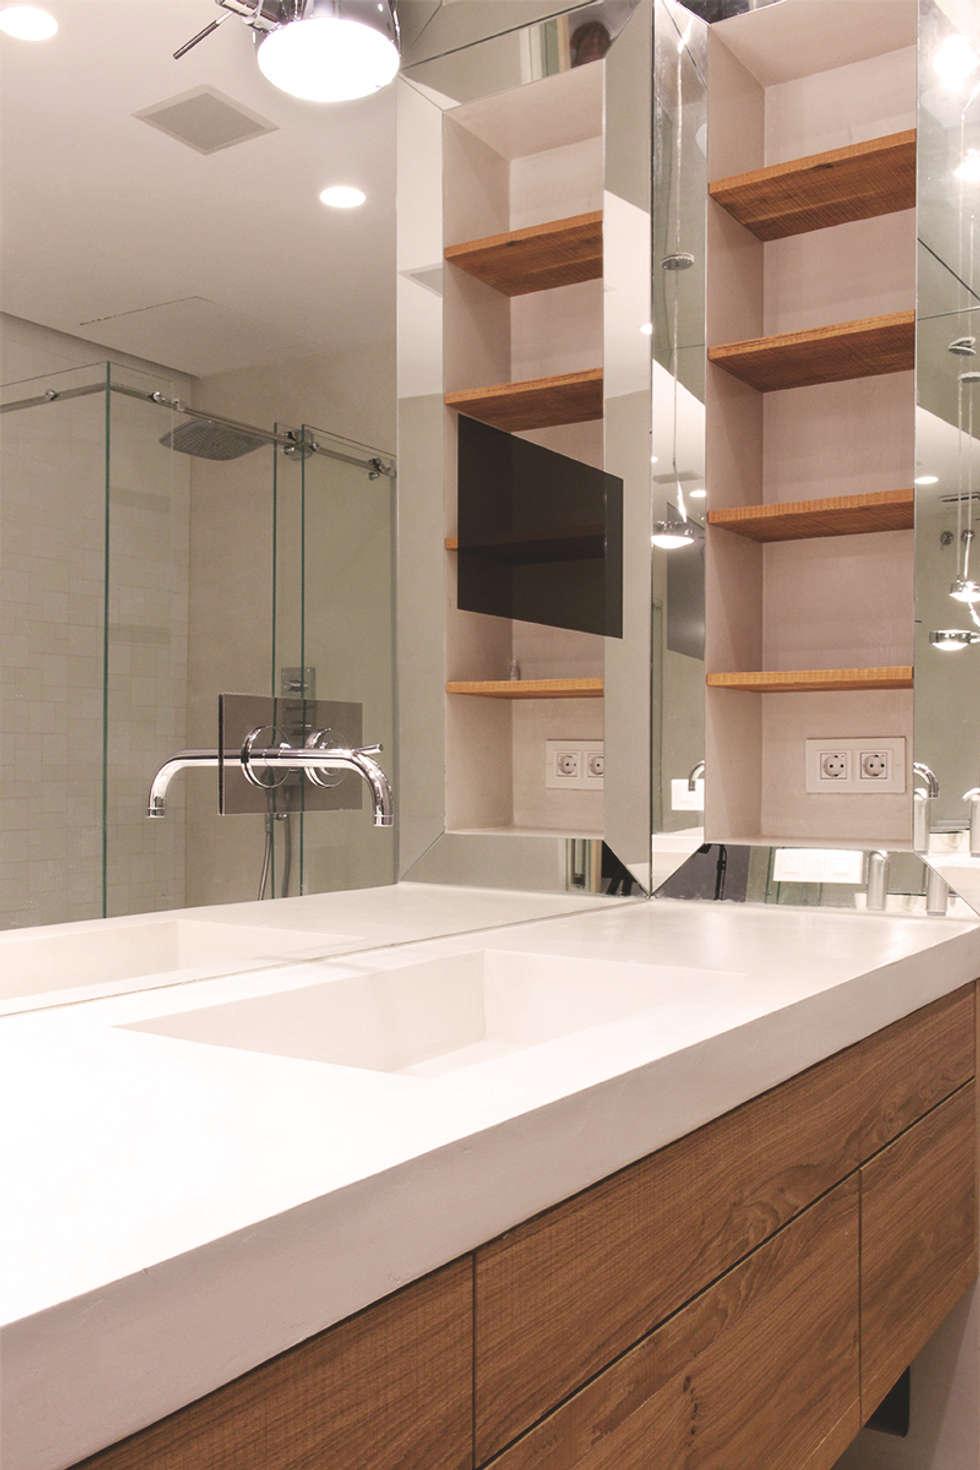 Baños de estilo moderno por Miriam Barrio